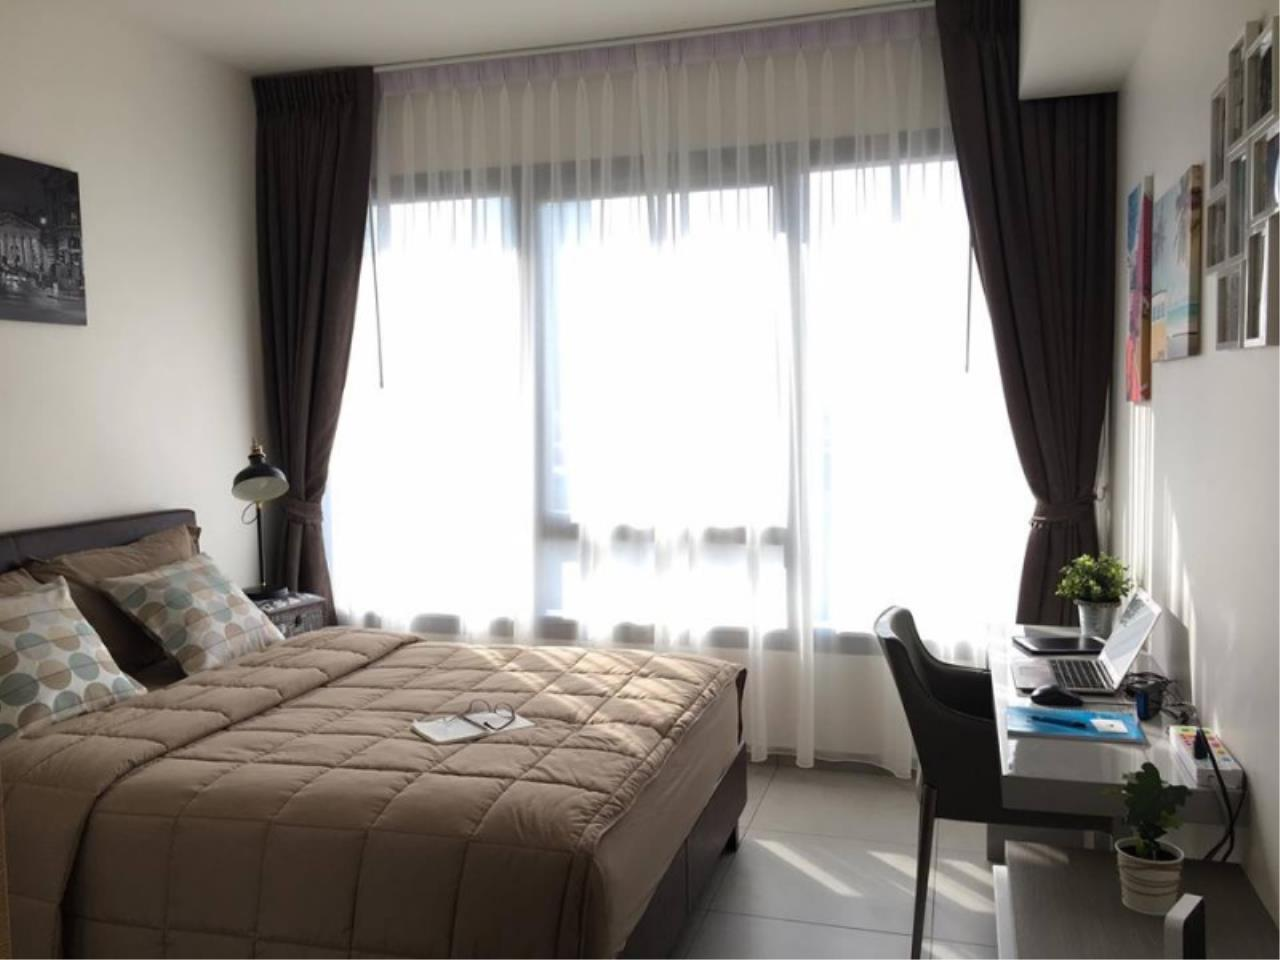 Century21 Skylux Agency's The Lofts Ekkamai / Condo For Sale / 1 Bedroom / 51 SQM / BTS Ekkamai / Bangkok 3